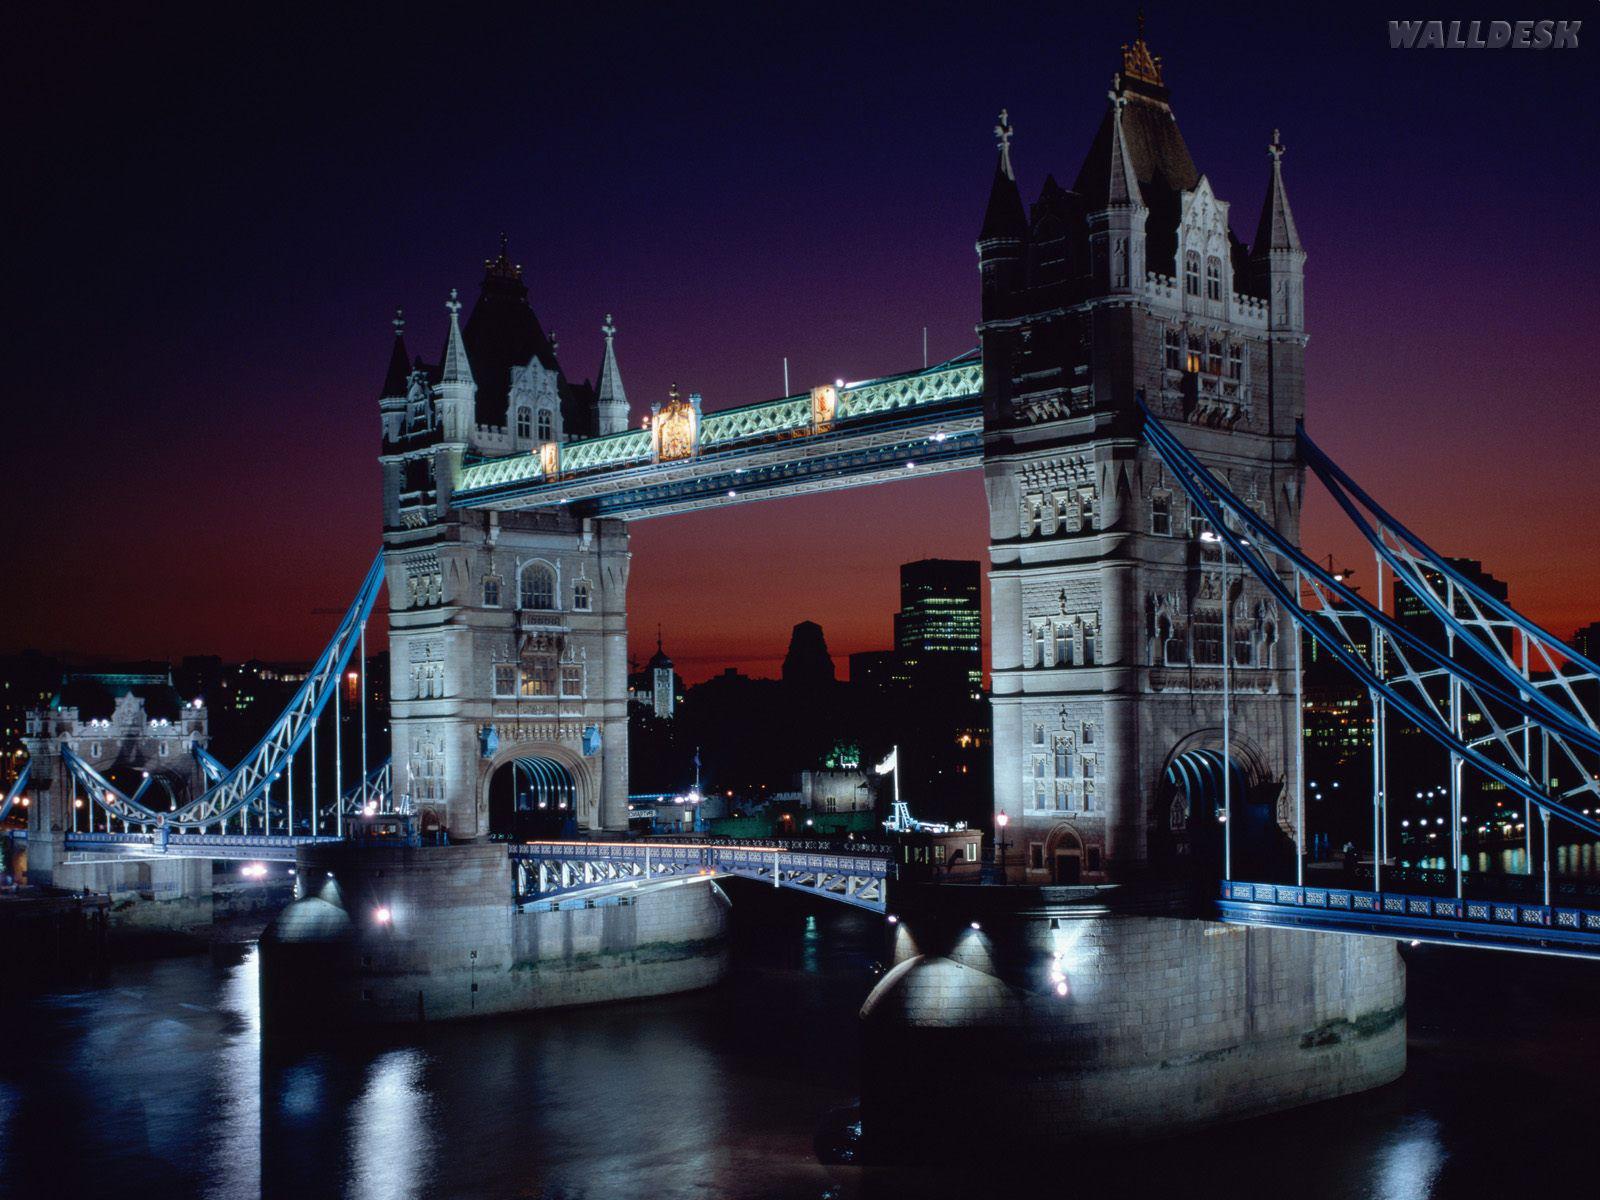 London In England 19 Desktop Background - Hivewallpaper.com